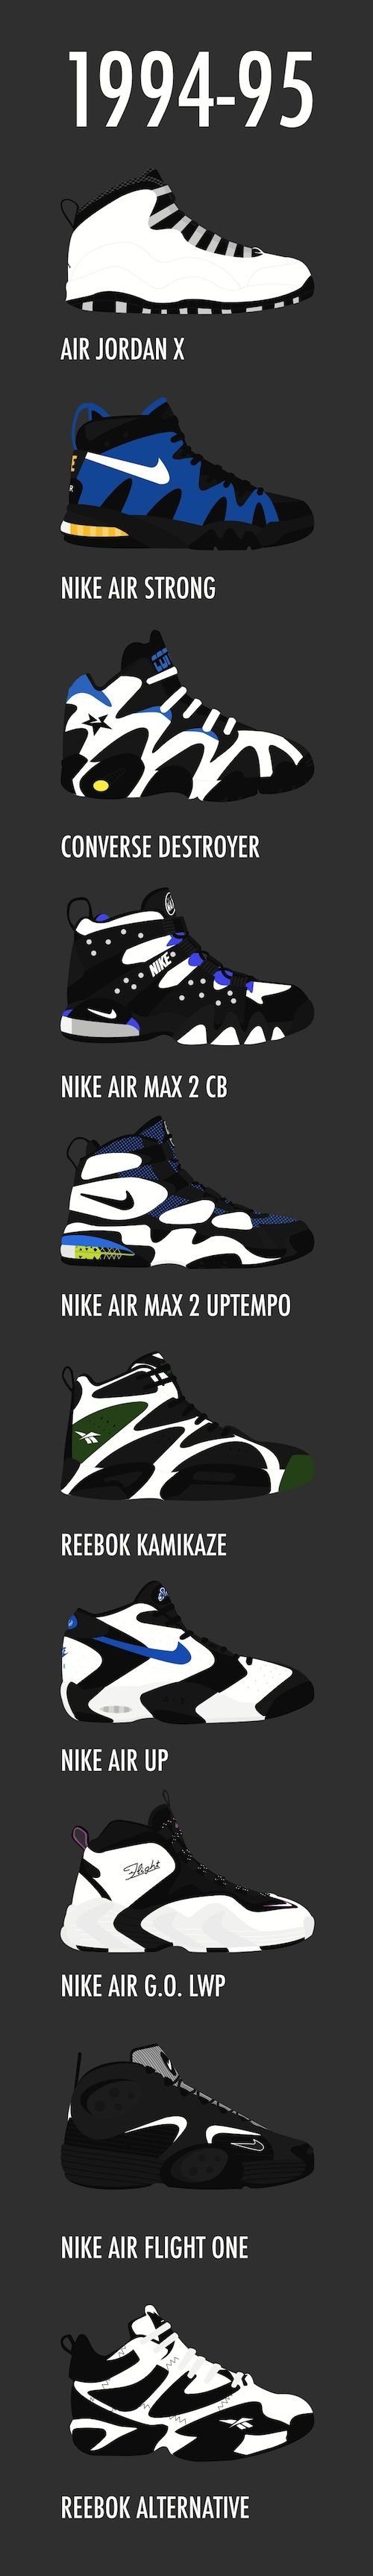 : scottie pippen shoes Nike